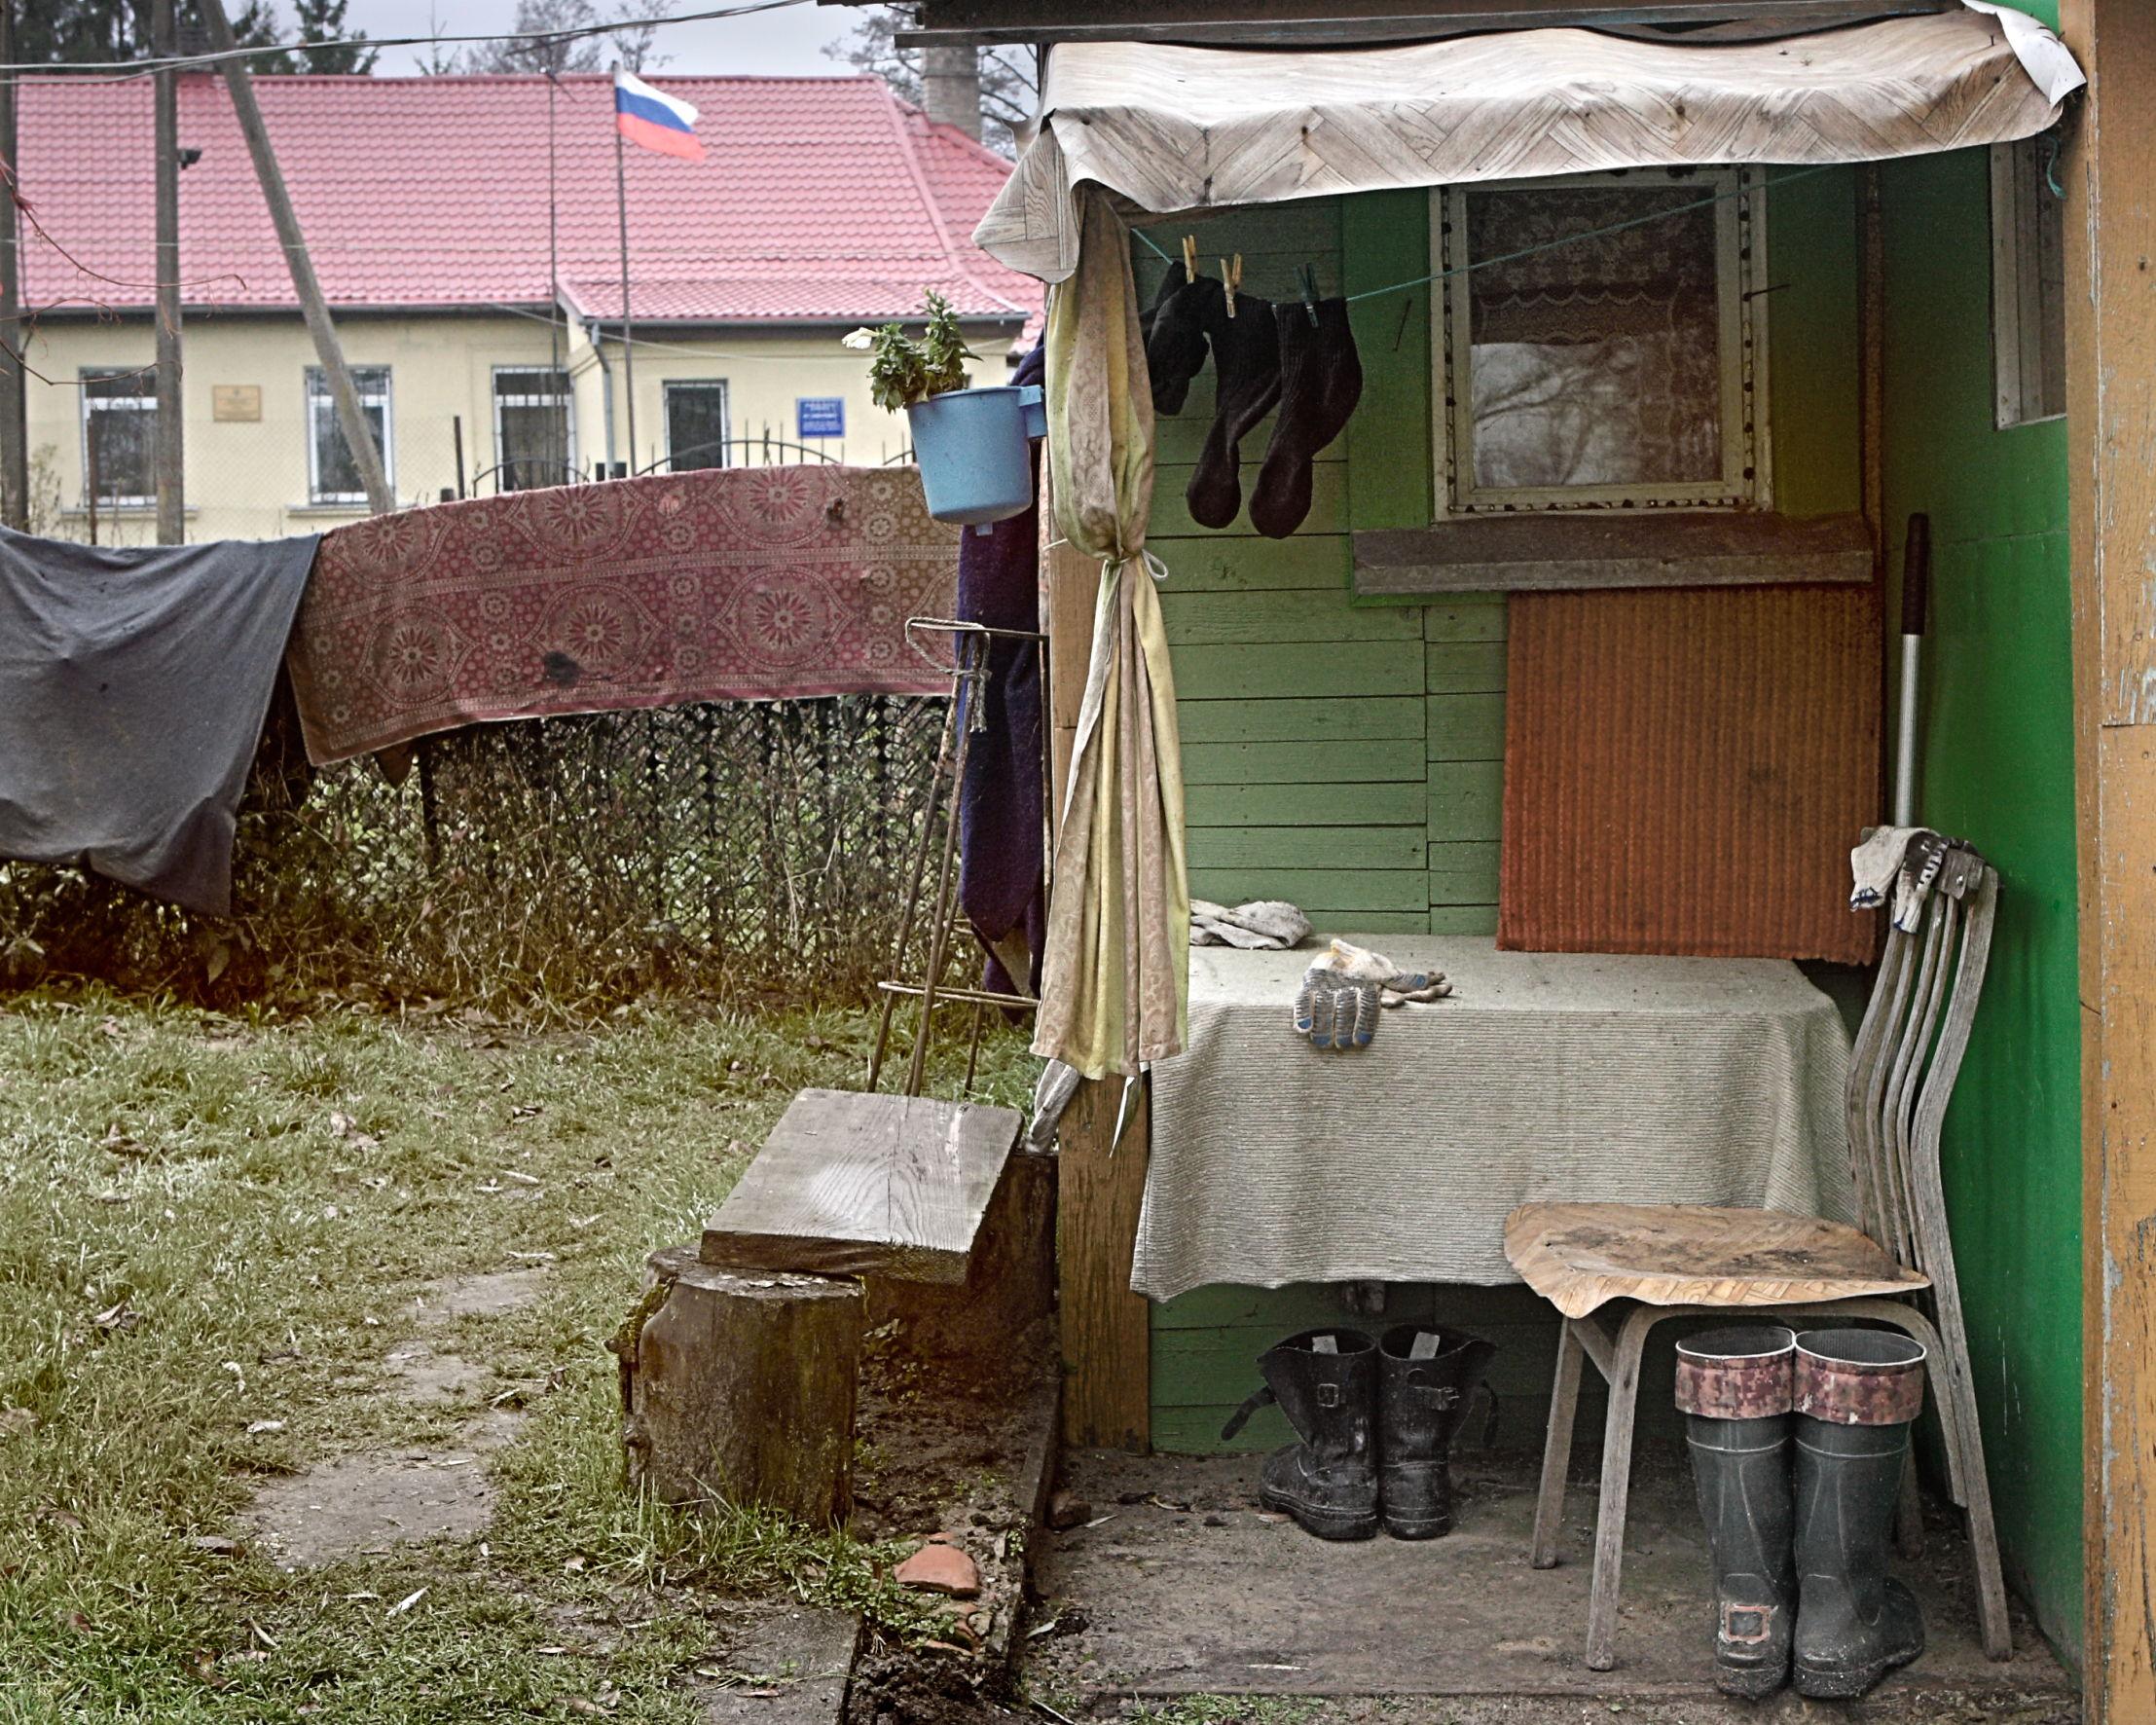 01_arturas-valiauga_ilgesio-zeme_2012-42